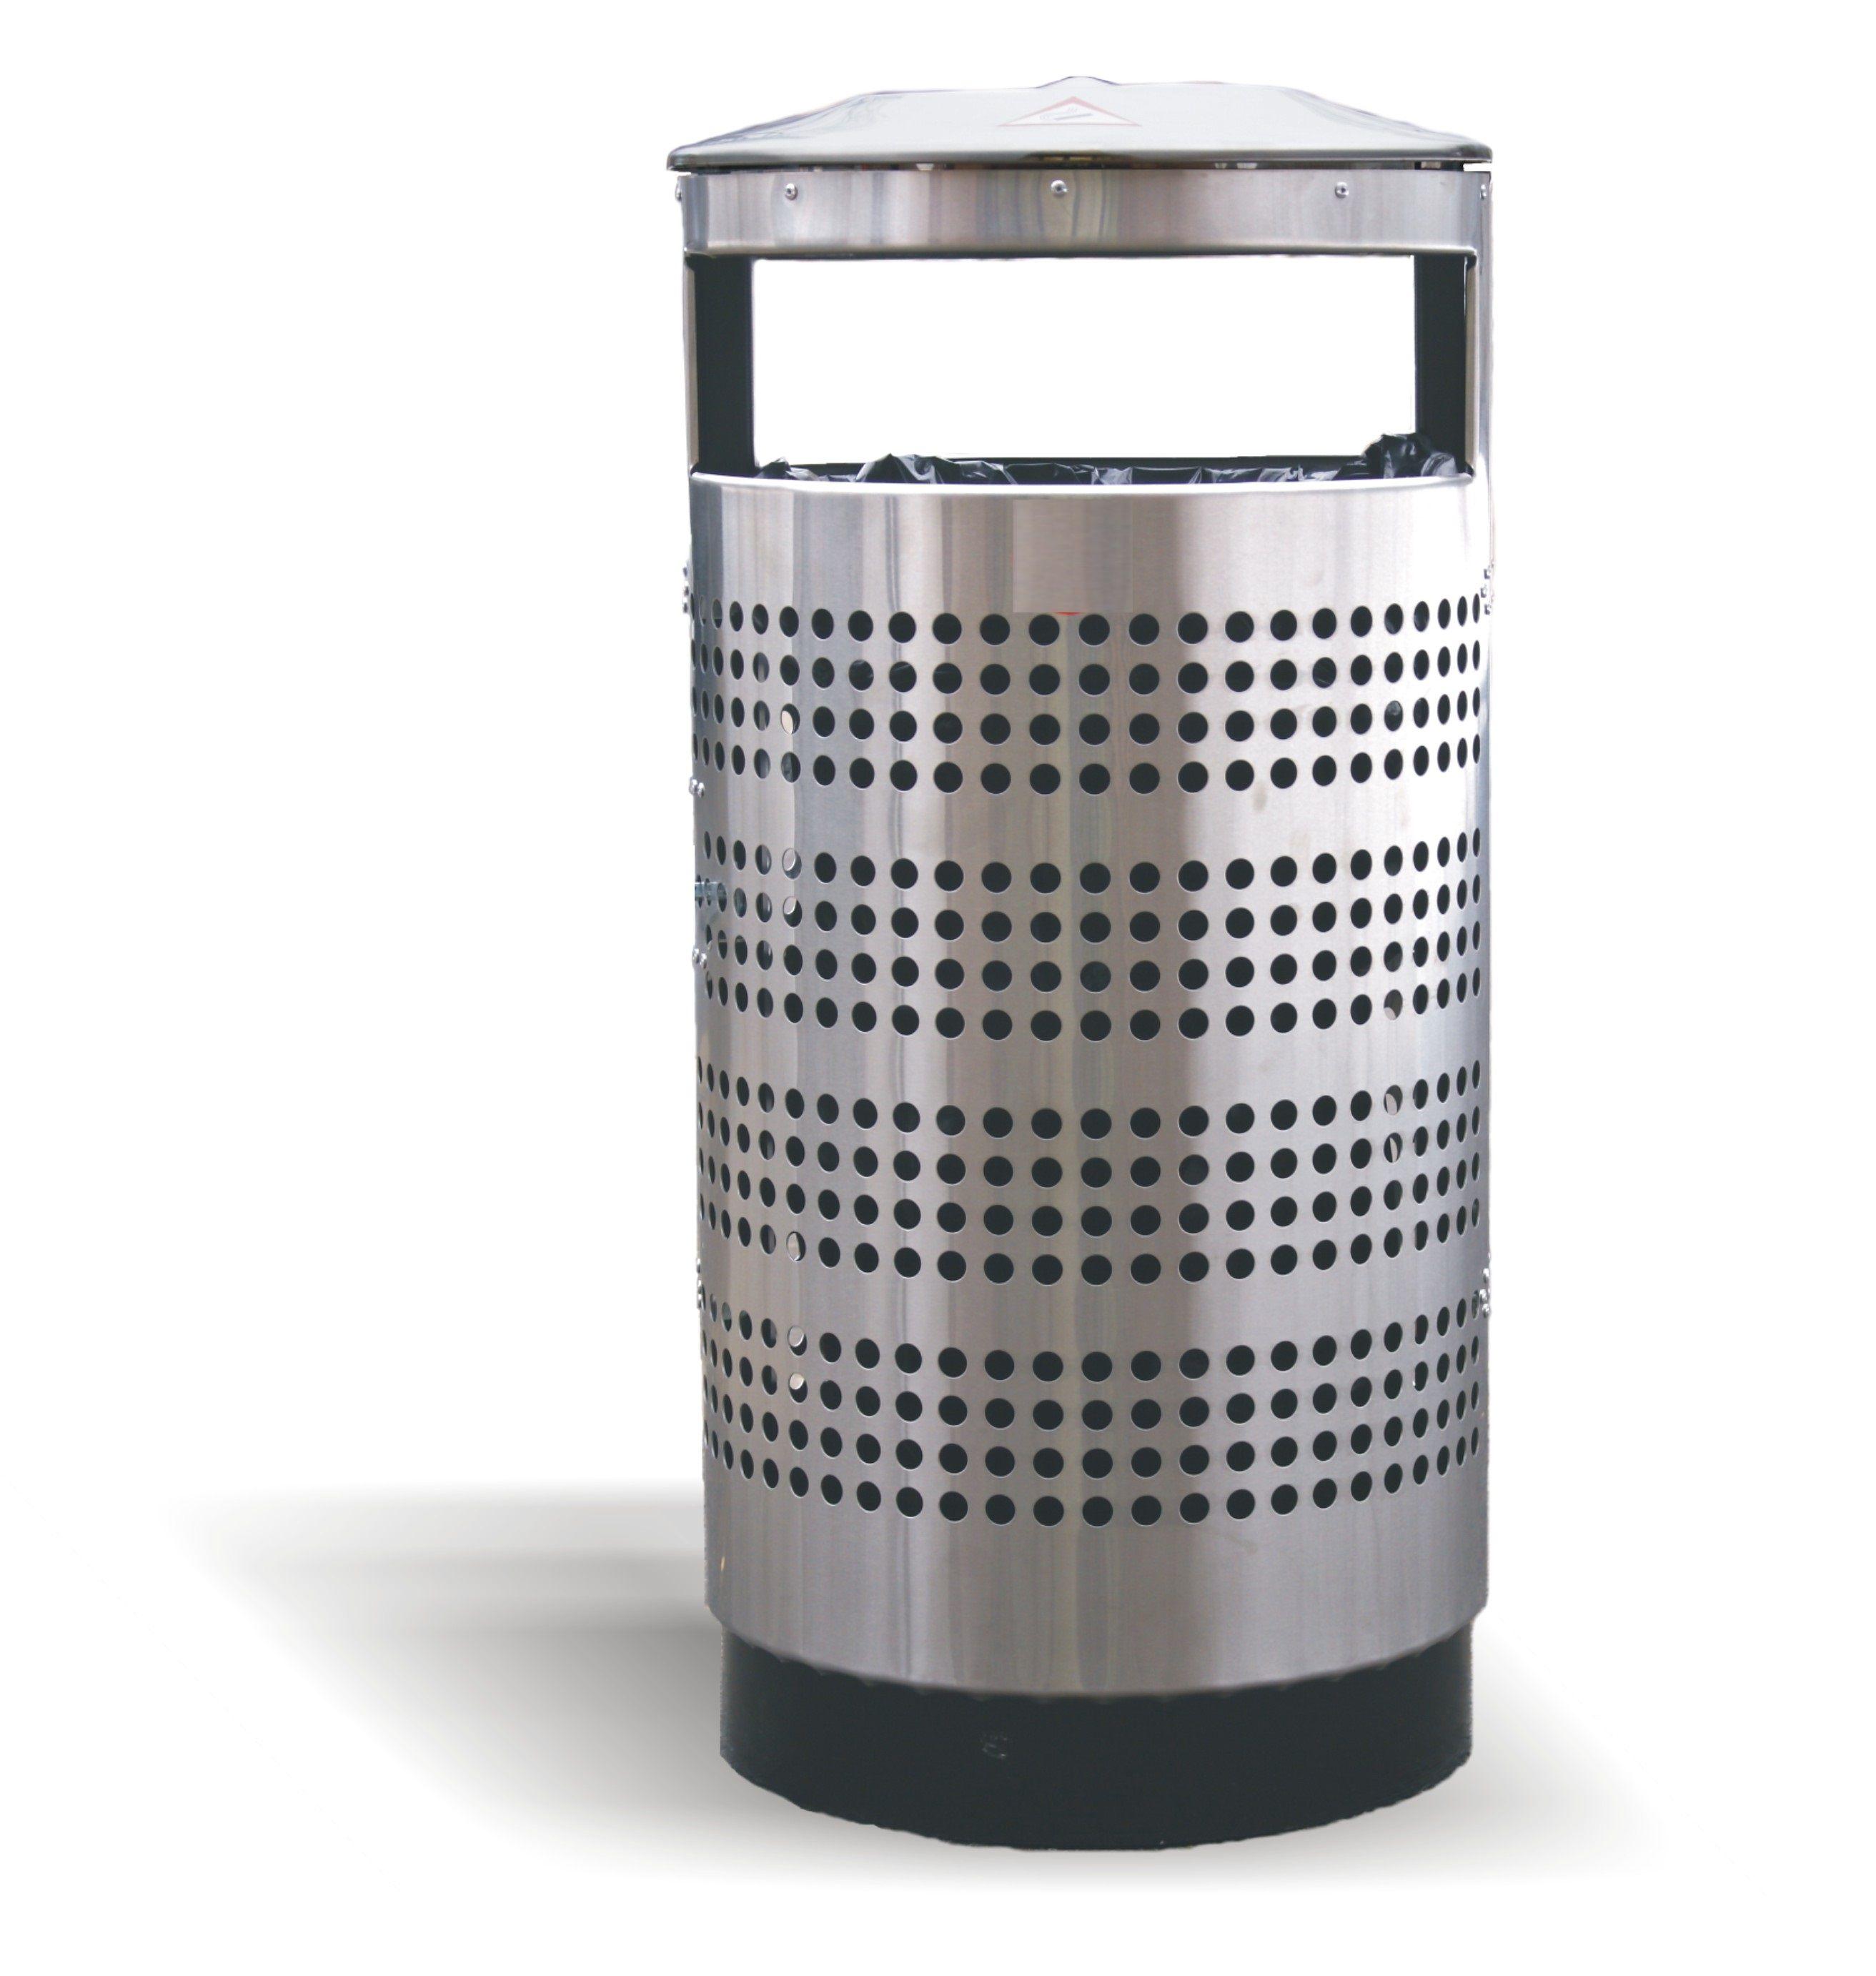 poubelle australia inox vigipirate. Black Bedroom Furniture Sets. Home Design Ideas